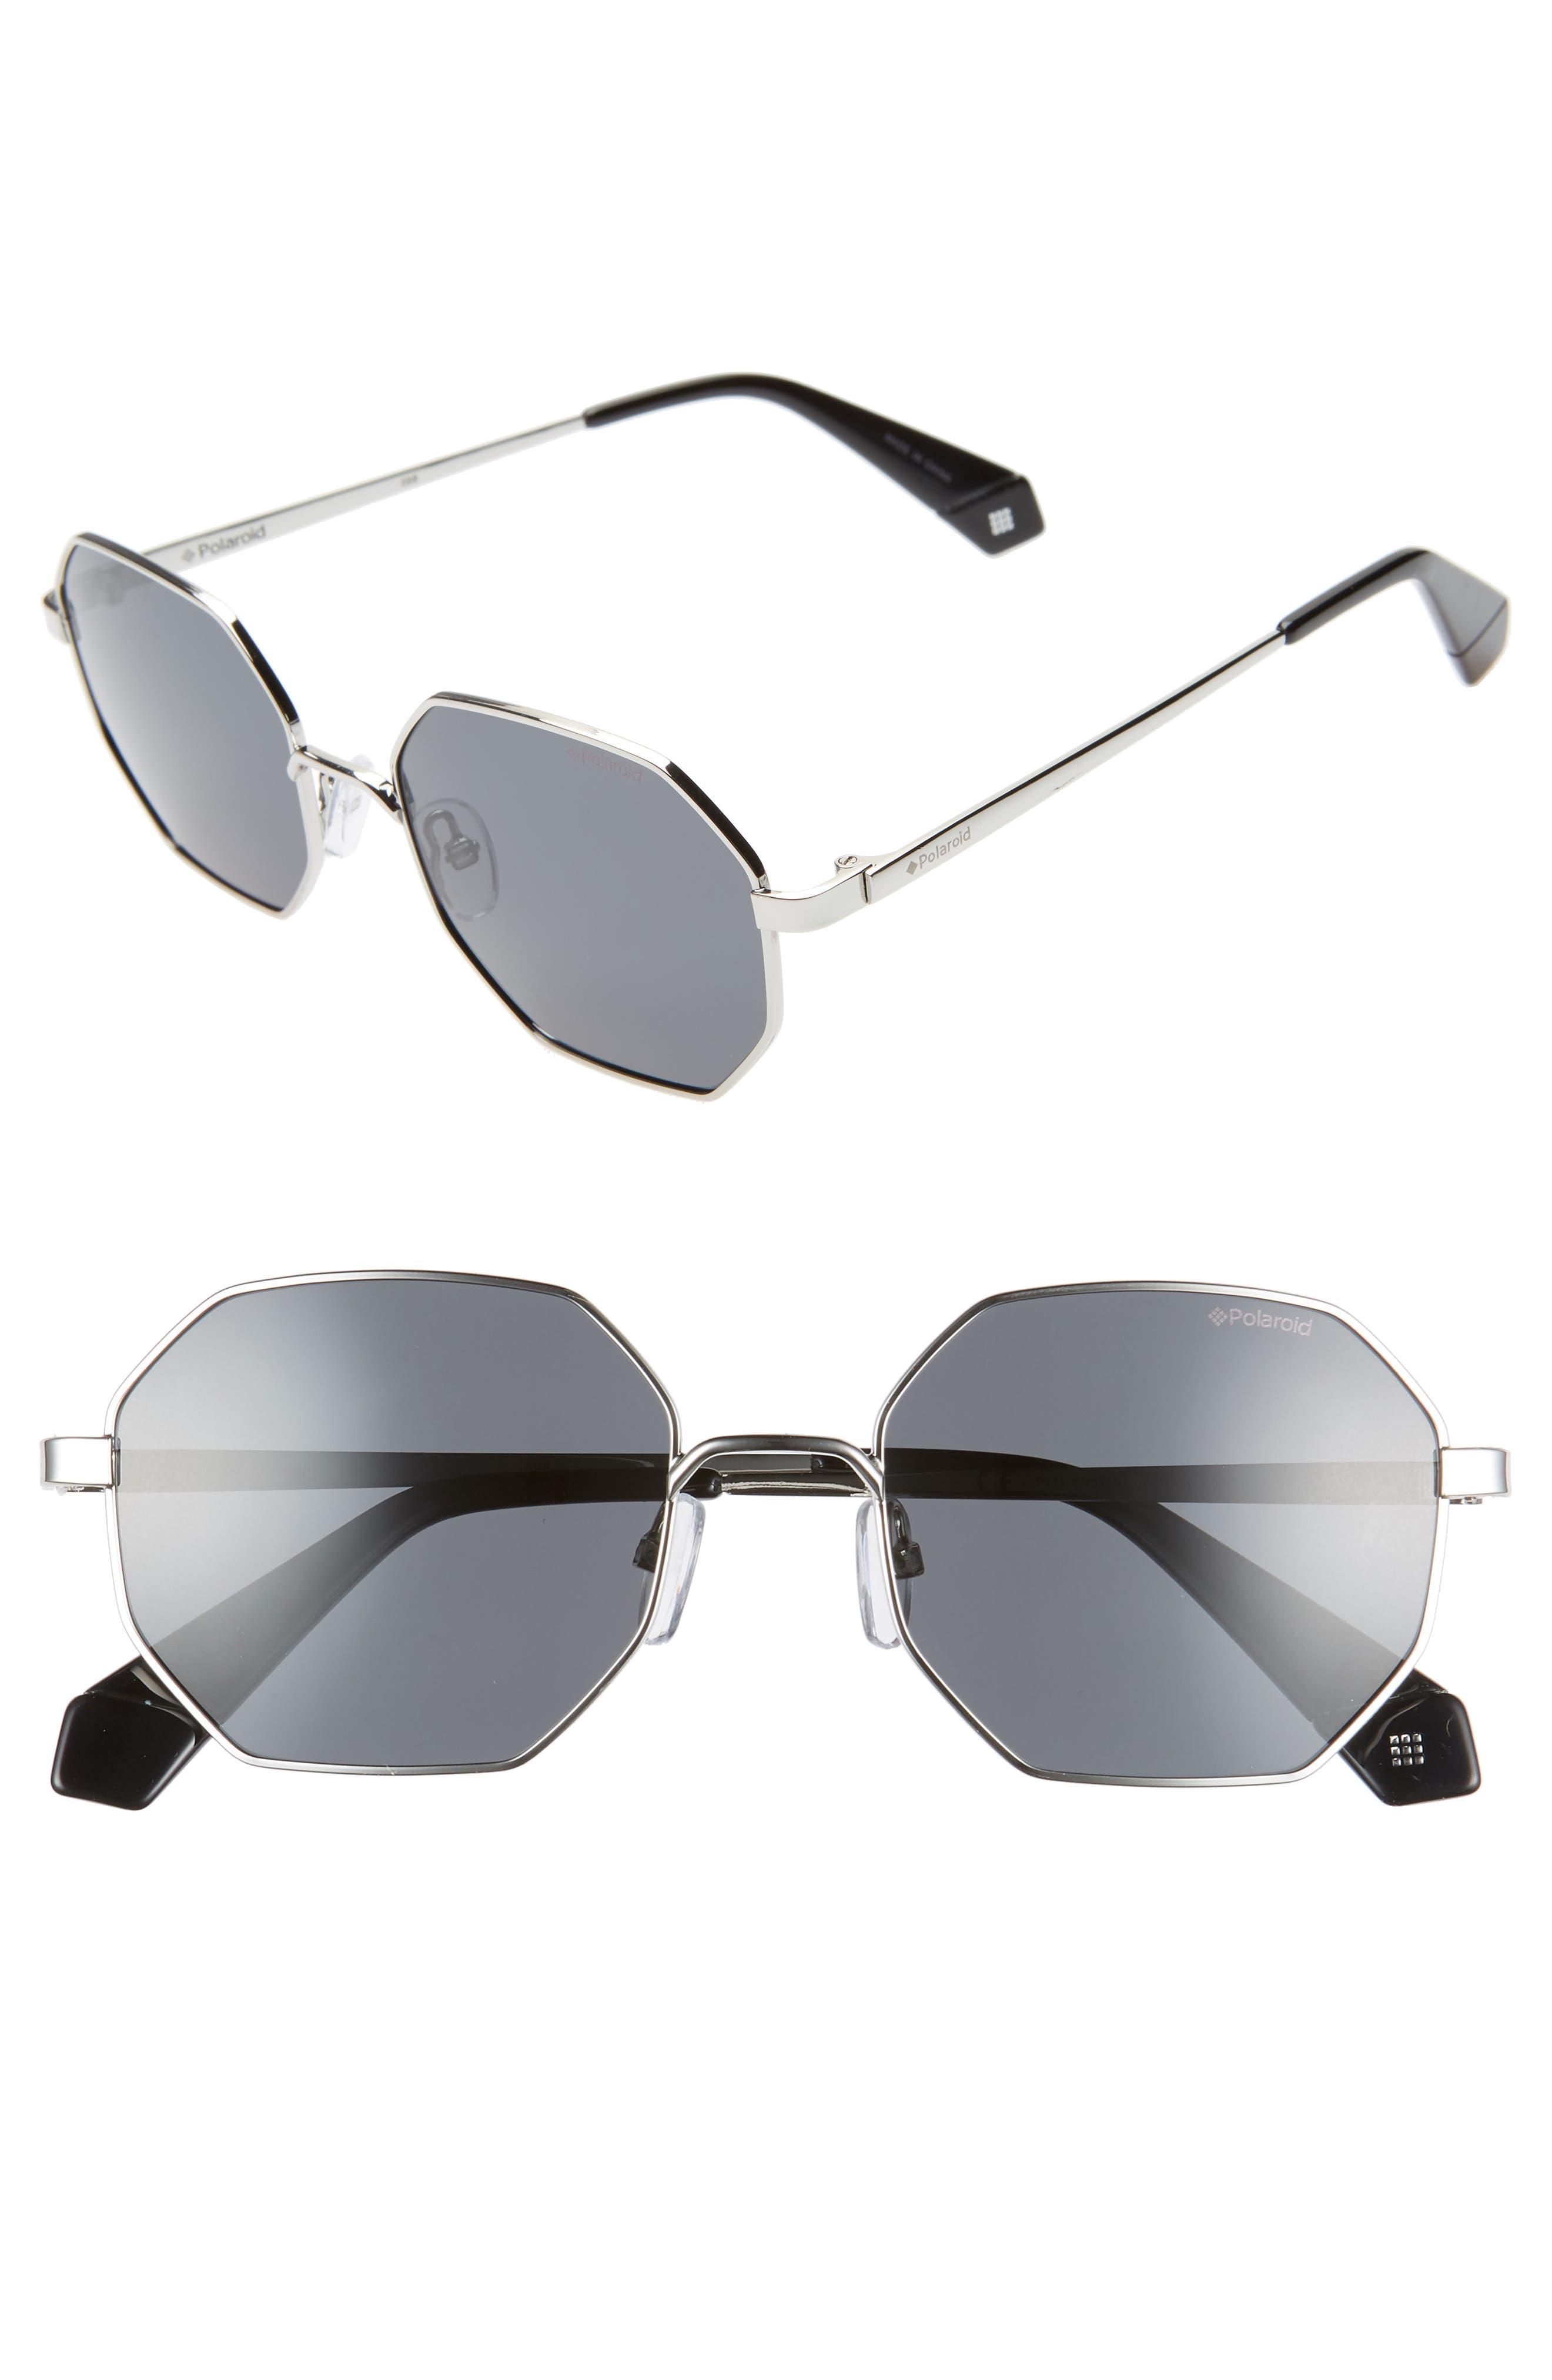 75ac11f88ee Polaroid Sunglasses for Women